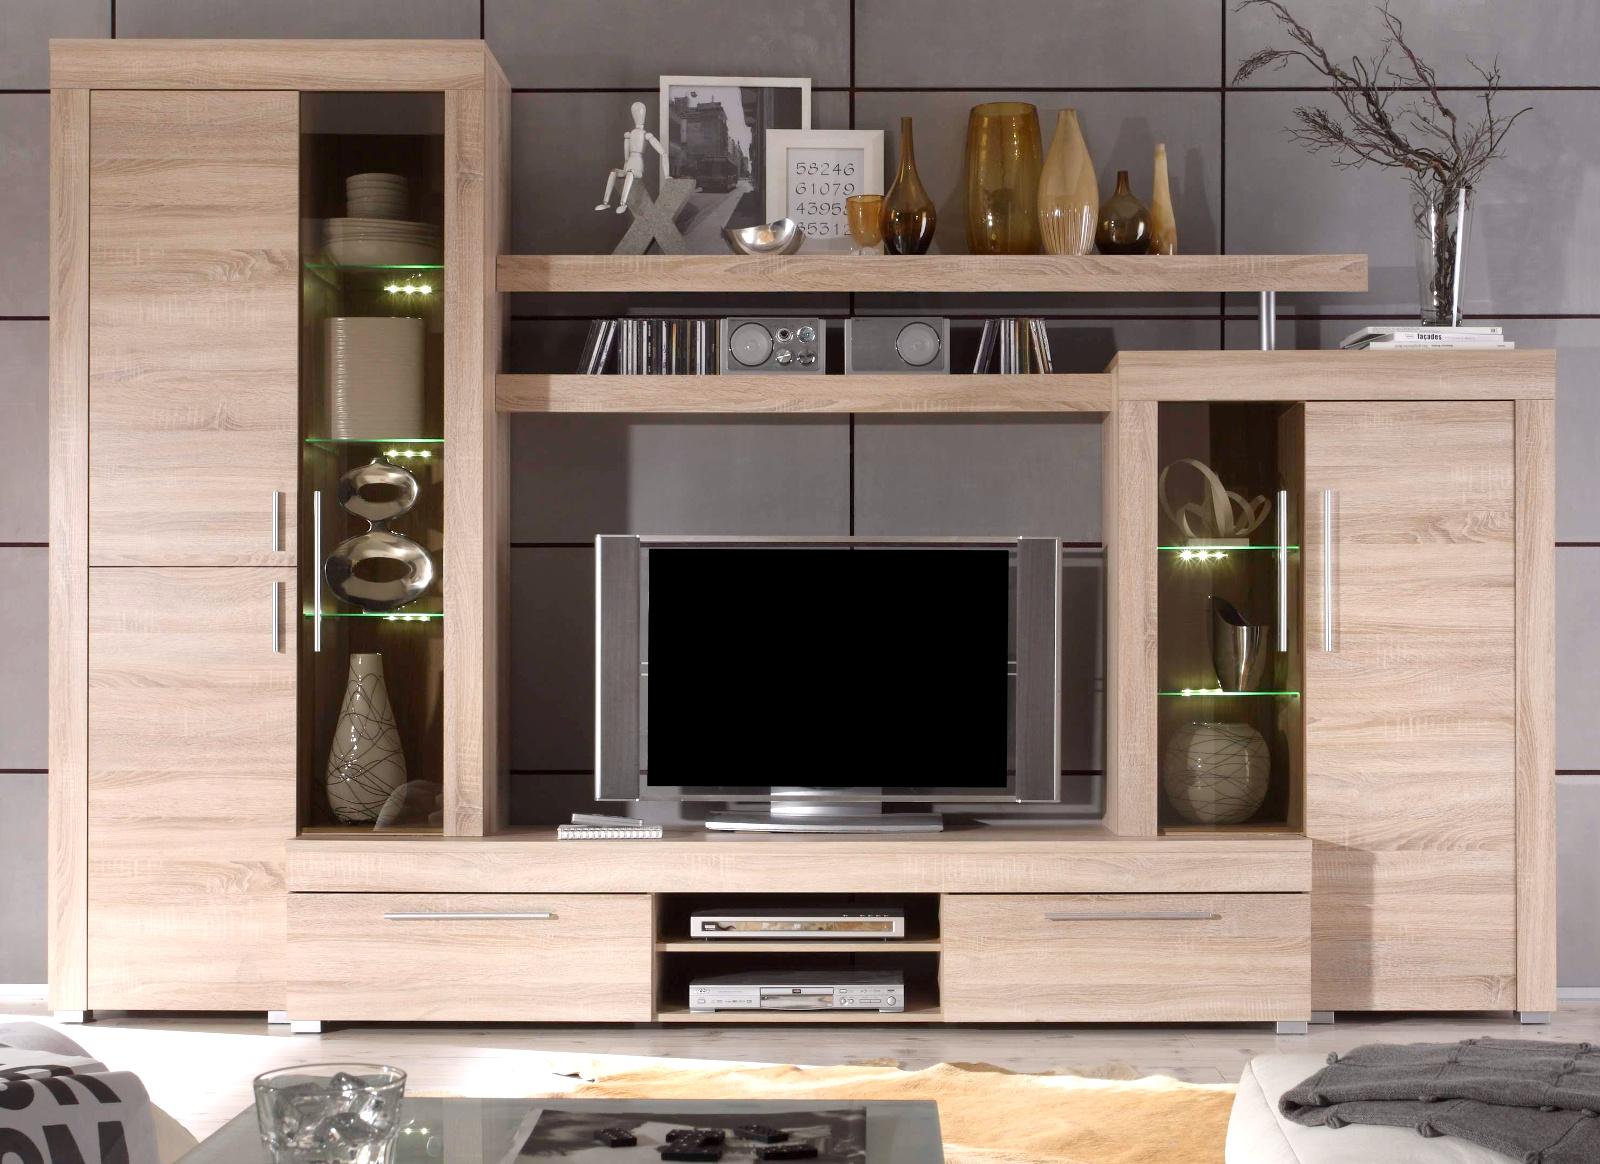 wohnwand schrankwand sonoma eiche anbauwand vitrine inkl led beleuchtung boom ebay. Black Bedroom Furniture Sets. Home Design Ideas